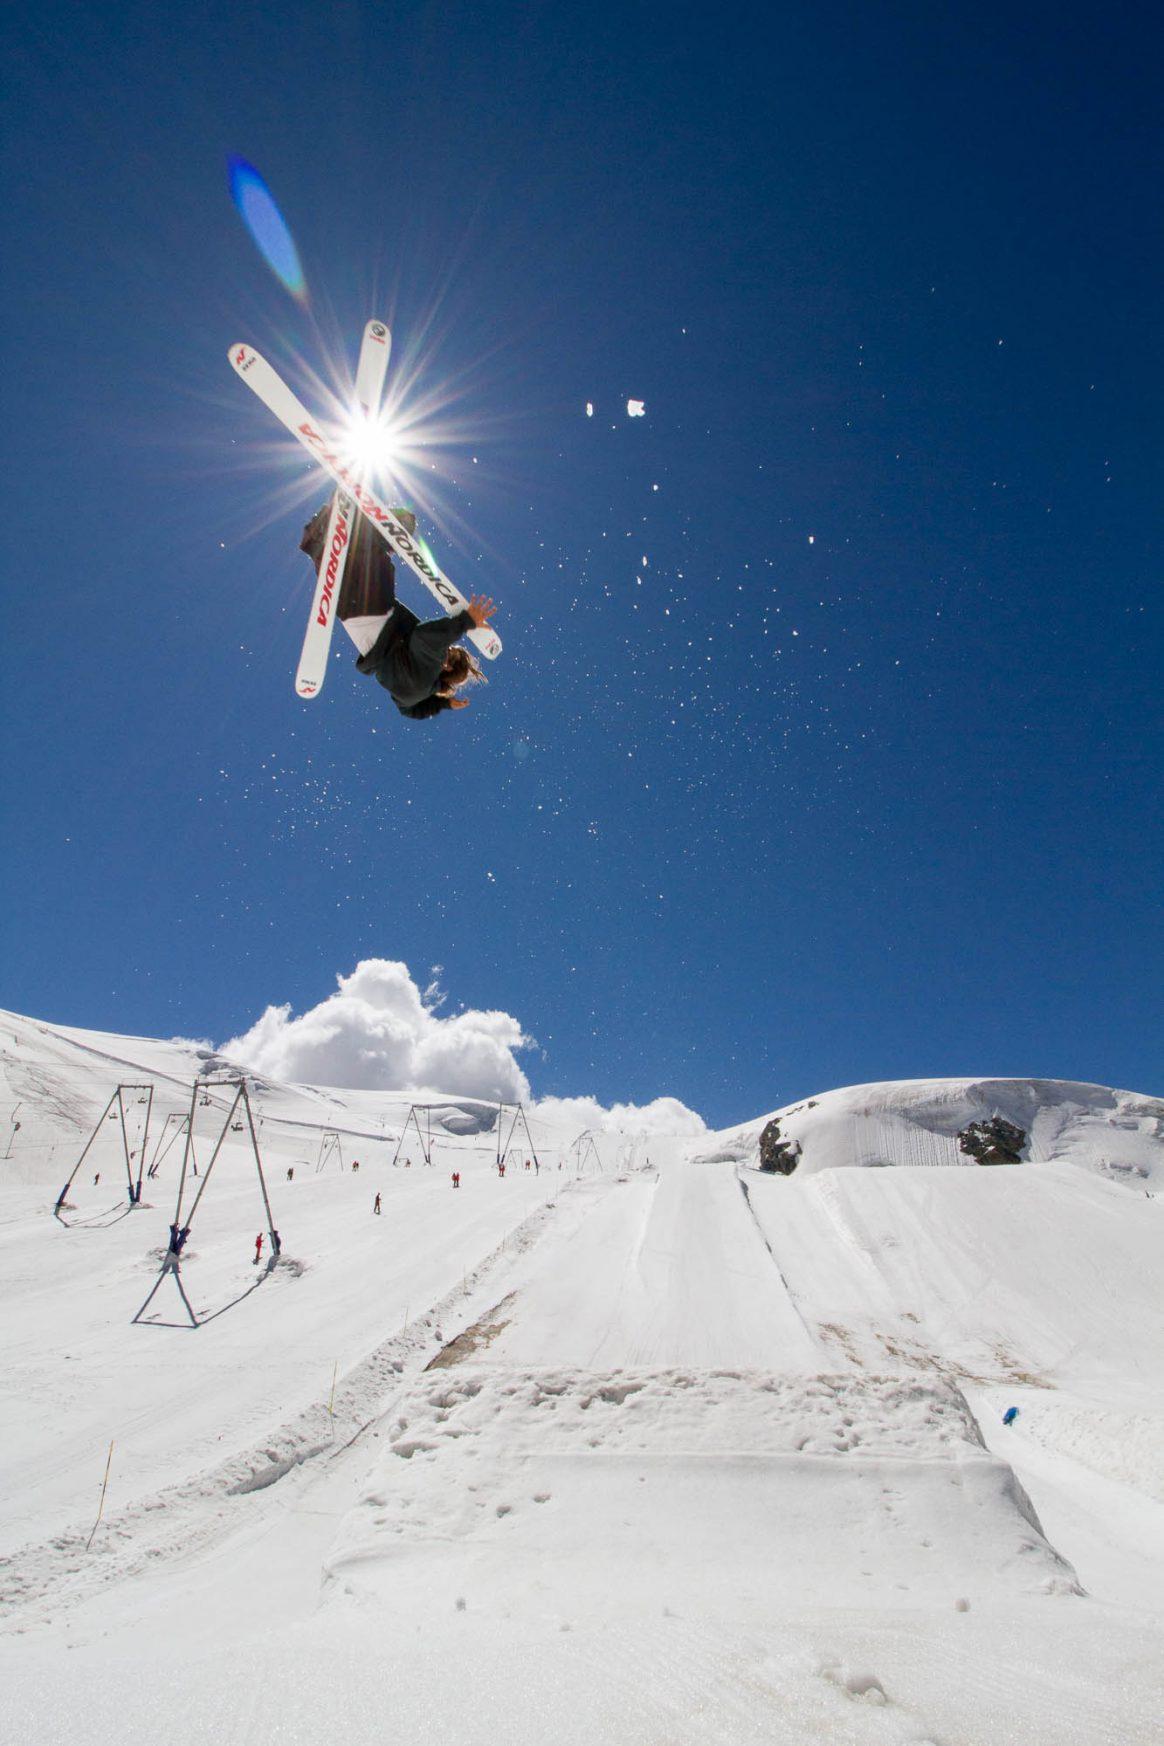 Andrin Tgetgel, Cork 7 Tail, Zermatt, Downdays, Ethan Stone